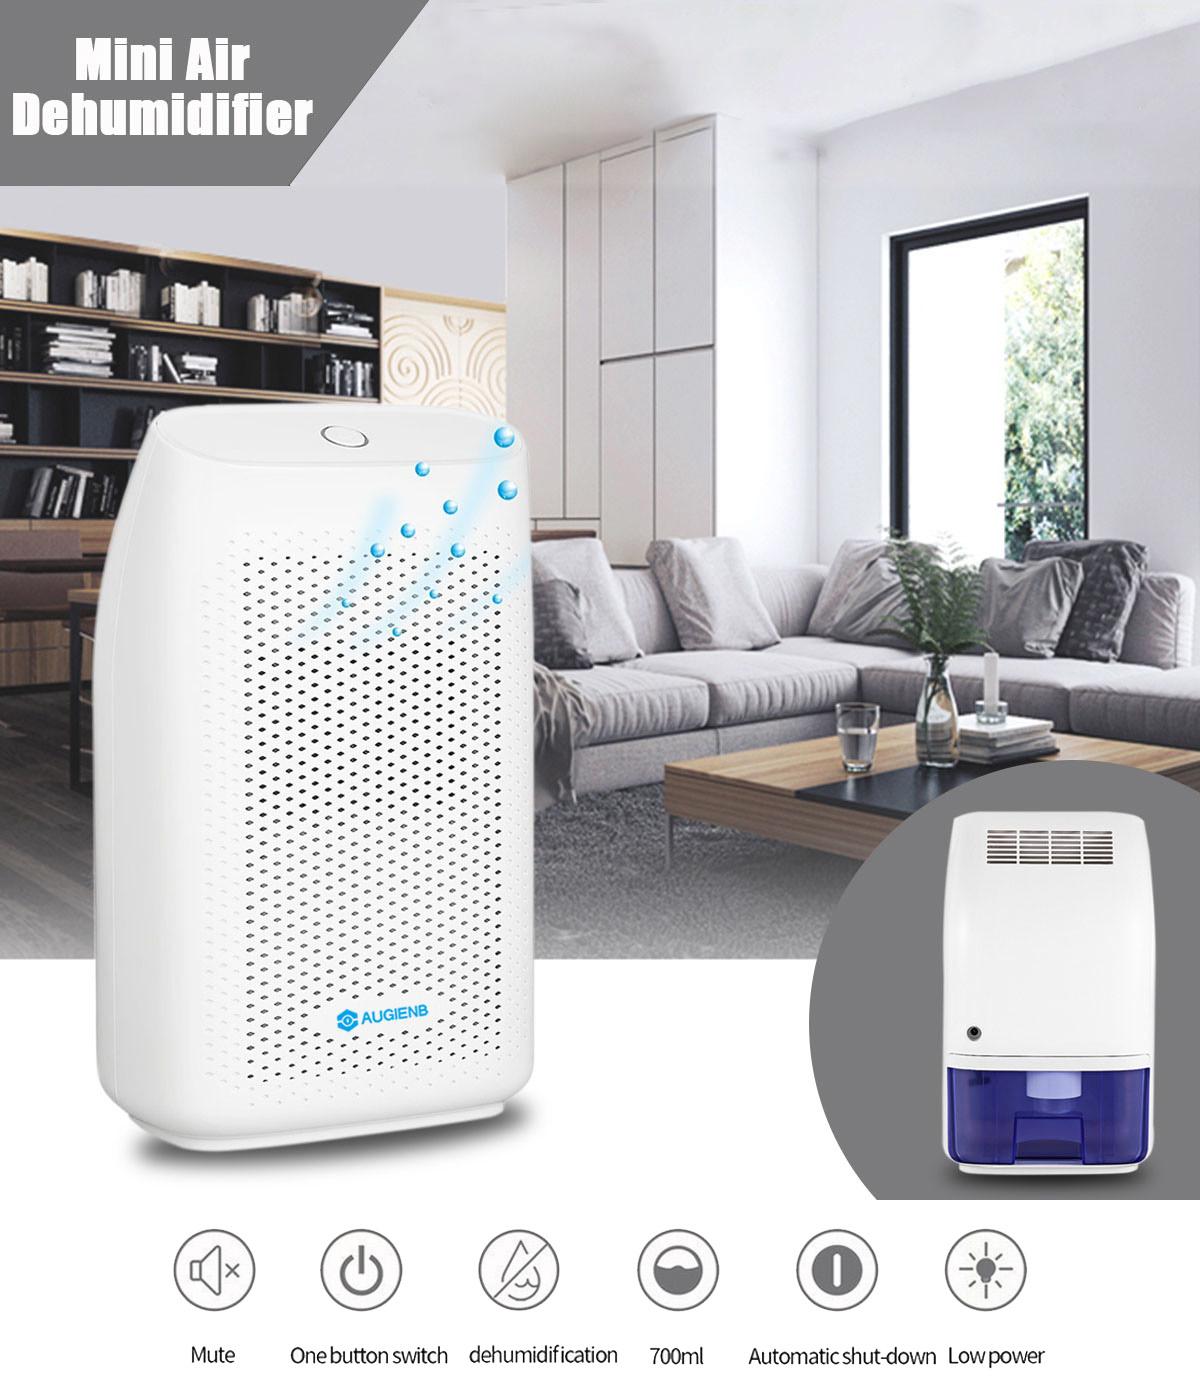 Augienb mini air dehumidifier 700ml compact and portable whisper quiet dehumidifier air dryer for Small dehumidifier for bedroom